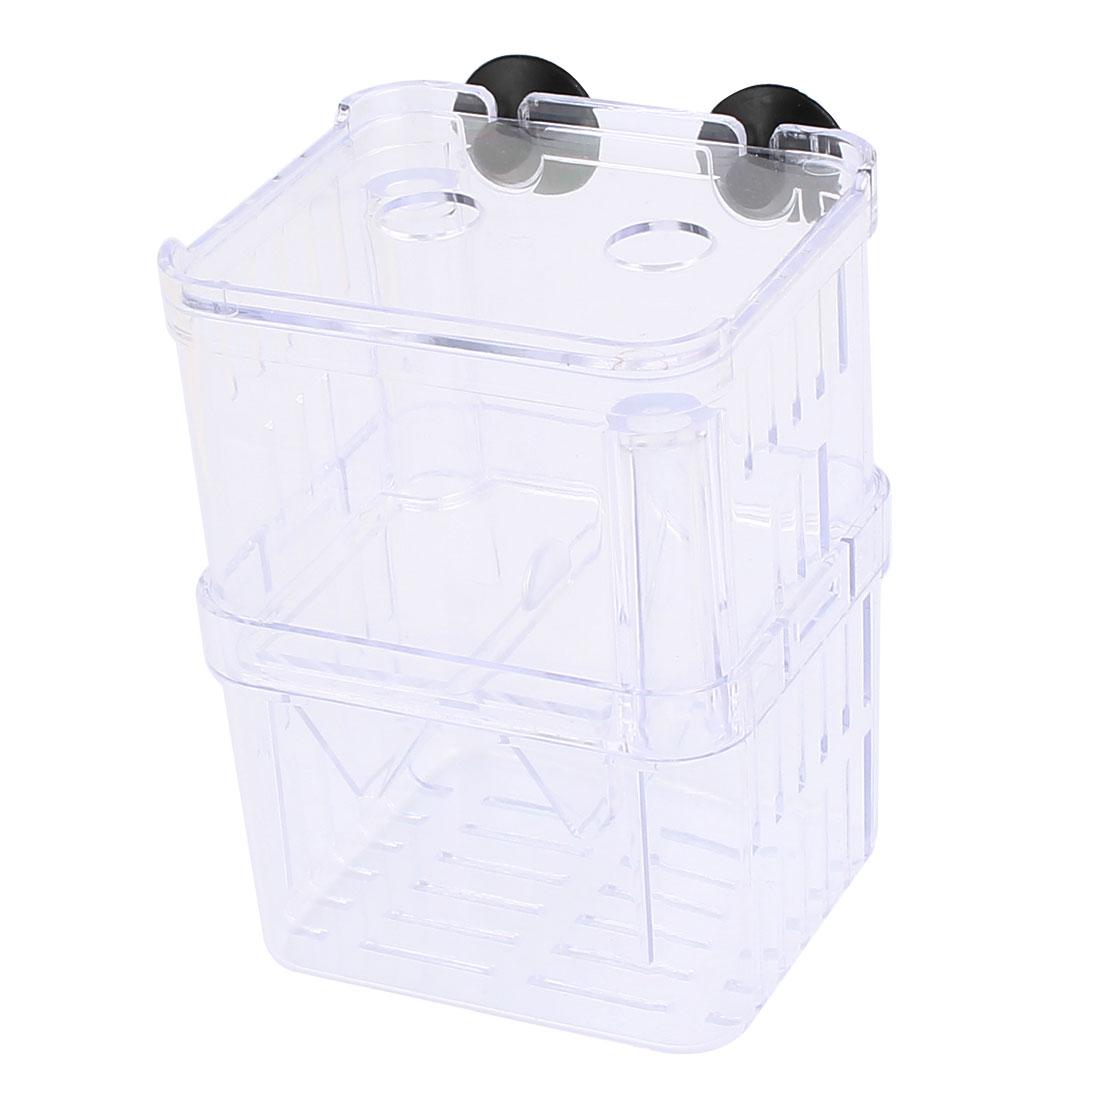 Clear Plastic Retangle Shape Isolation Self Floating Double-deck Divider for Fishbowl Aquarium